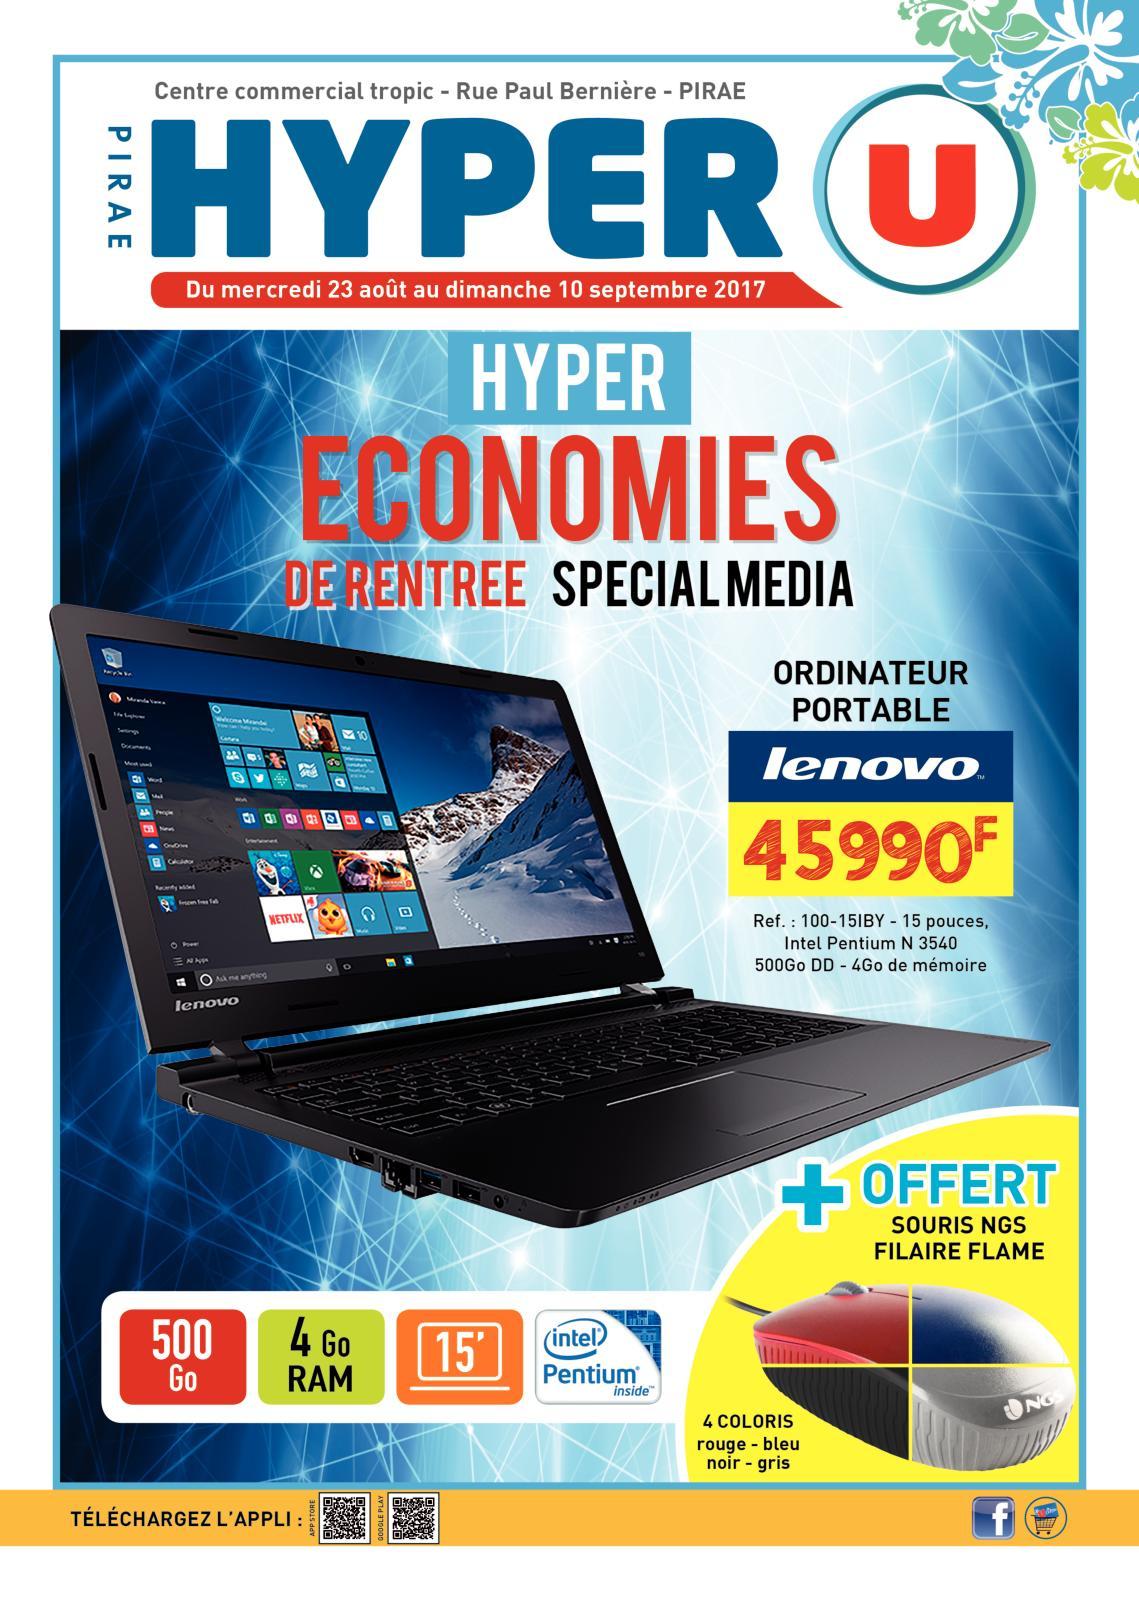 8addbf28a2 Calaméo - Catalogue Hyper U du 17/08/17